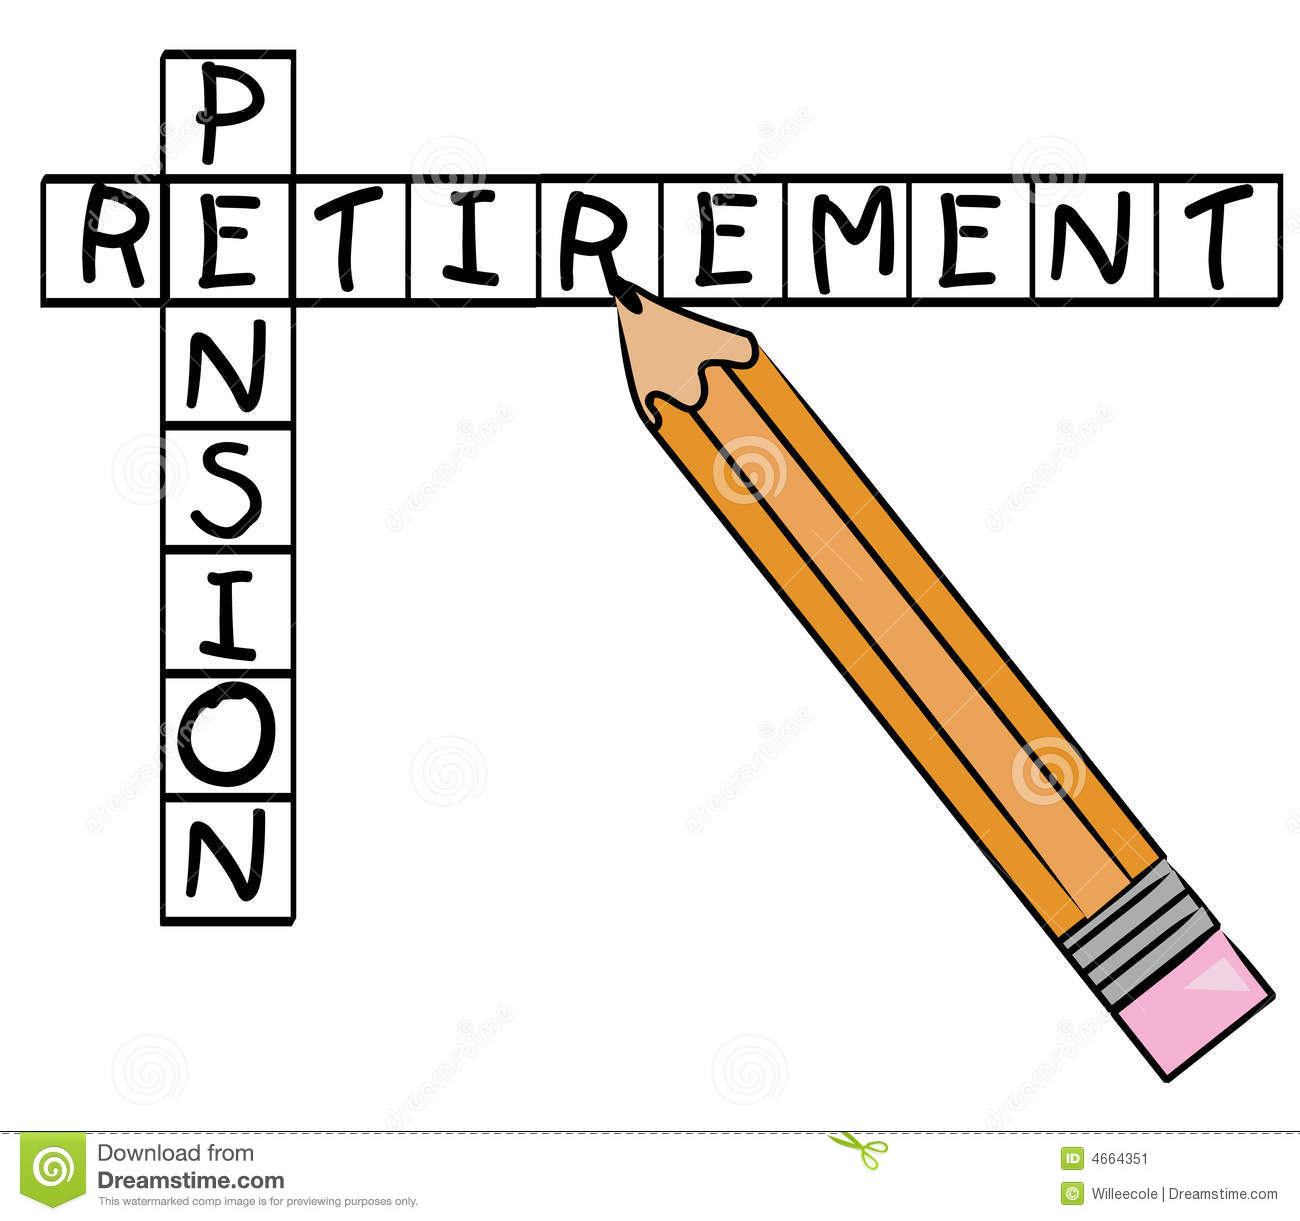 Retirement pension crossword.